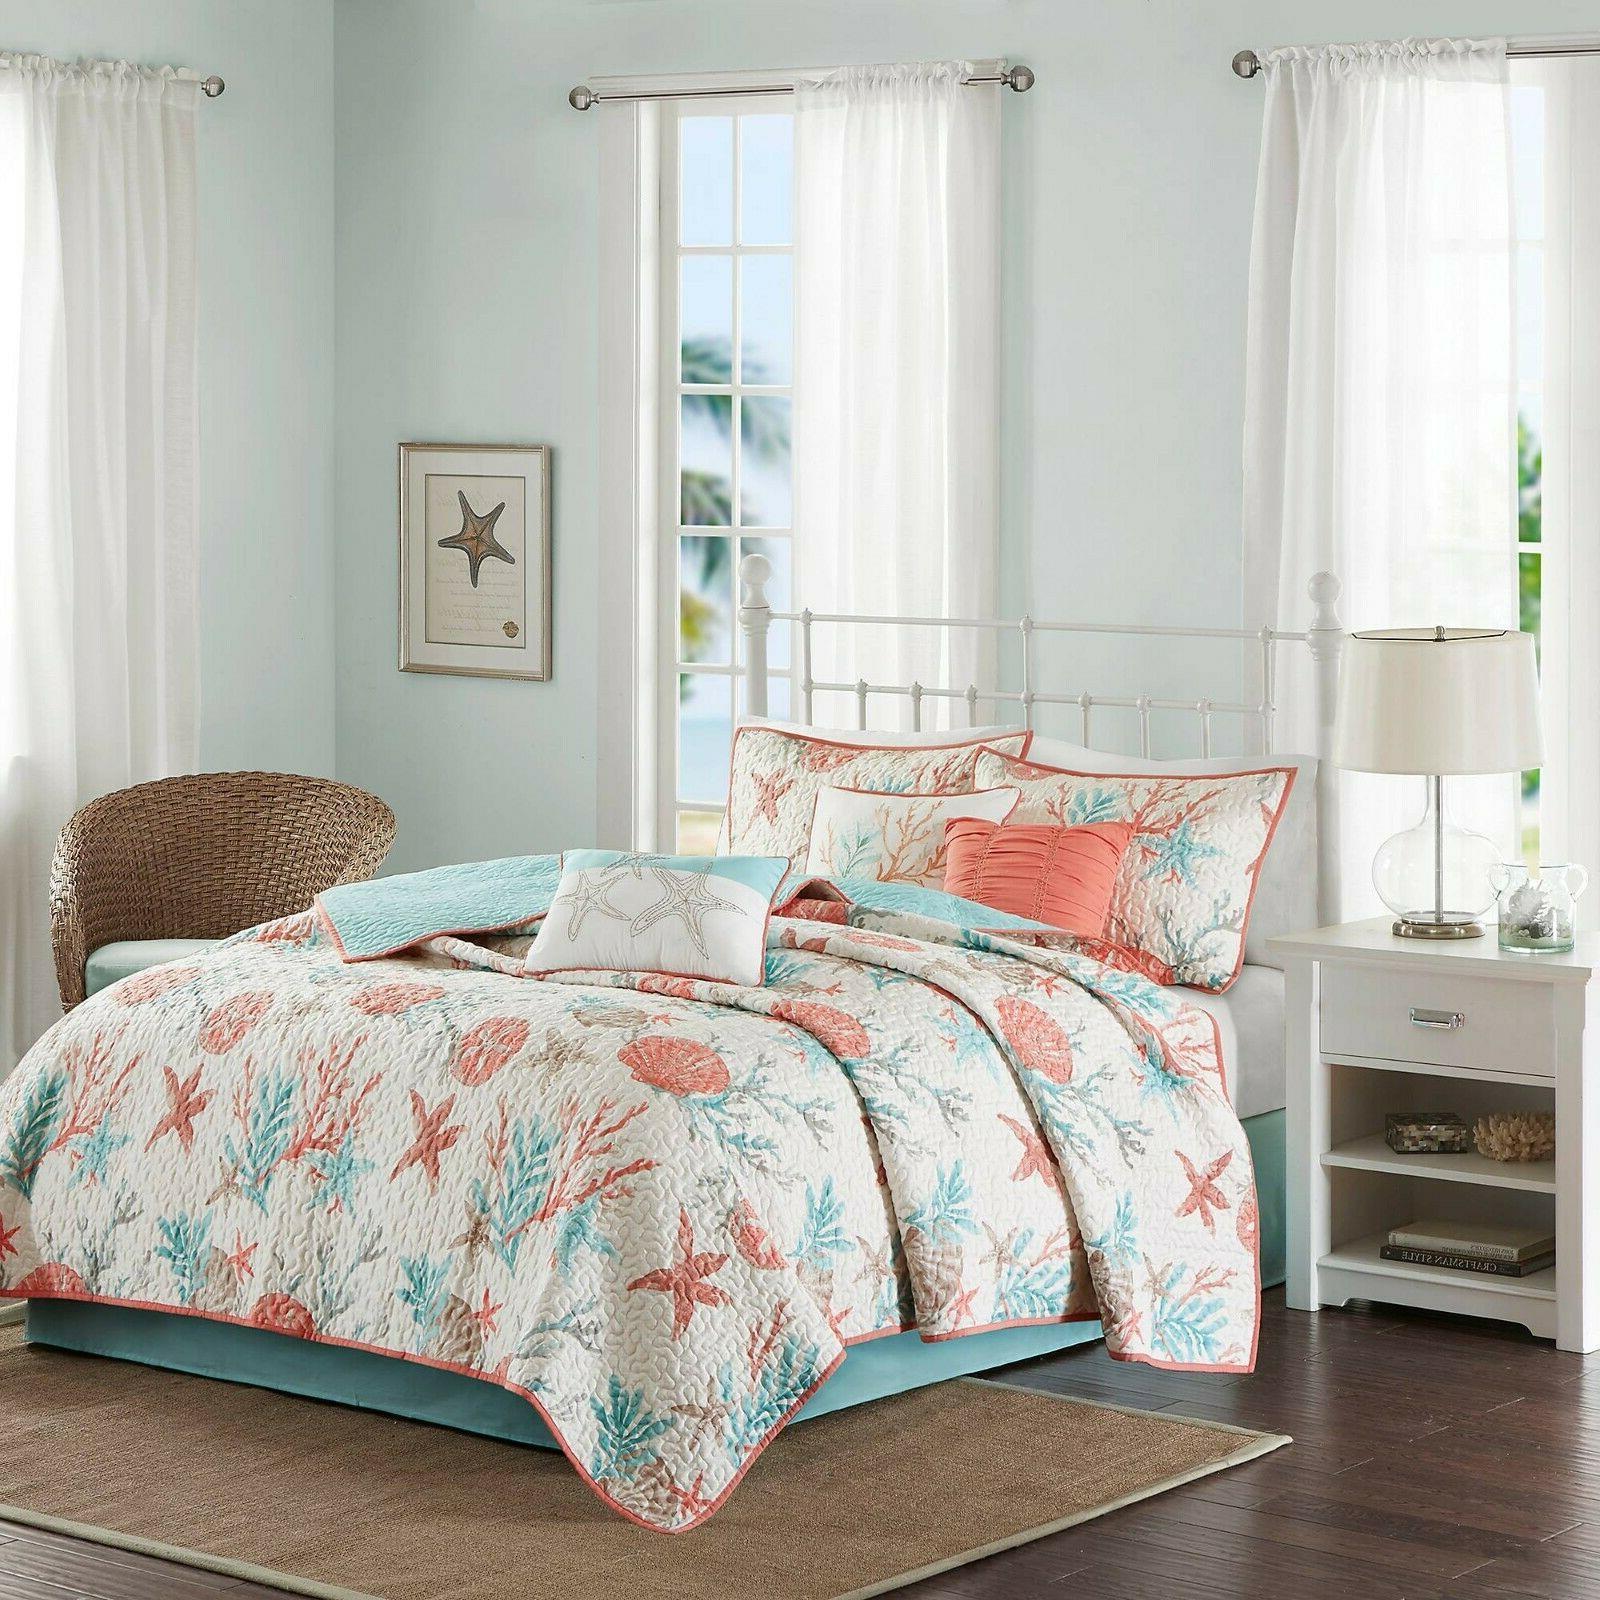 Madison Park Pebble Beach Full/Queen Size Quilt Bedding Set